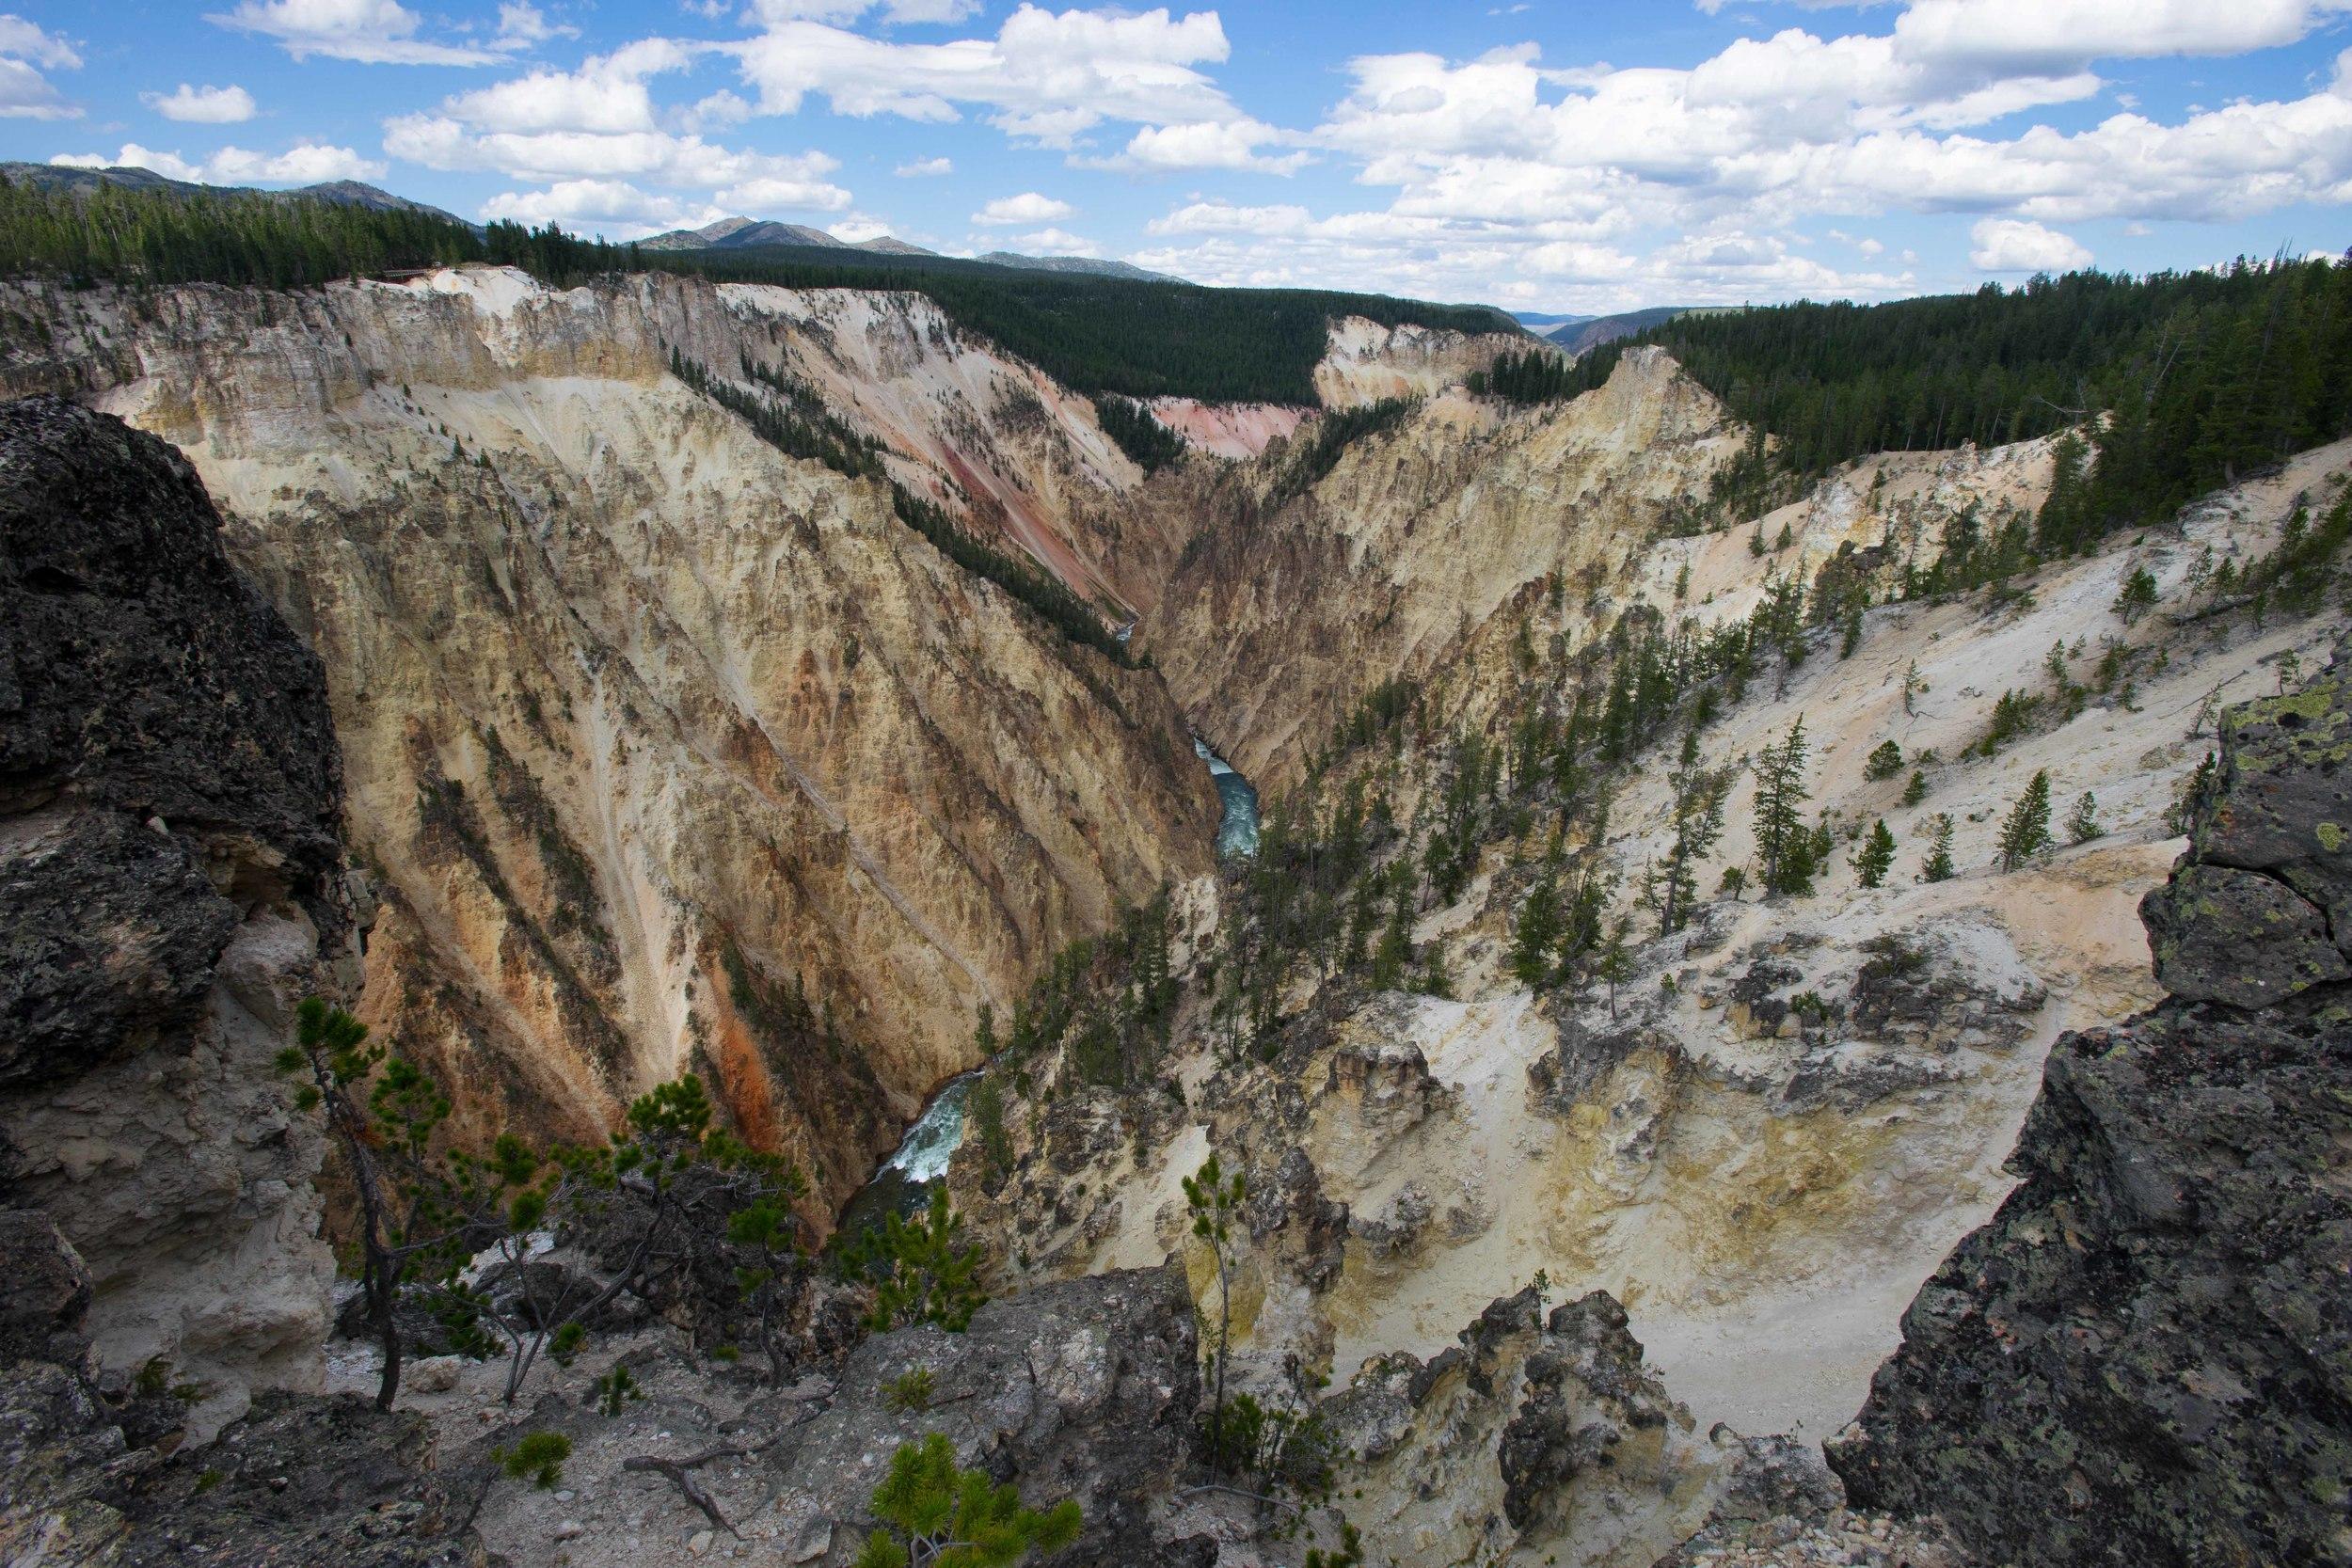 Yellowstone-Jul14-2015_28.jpg